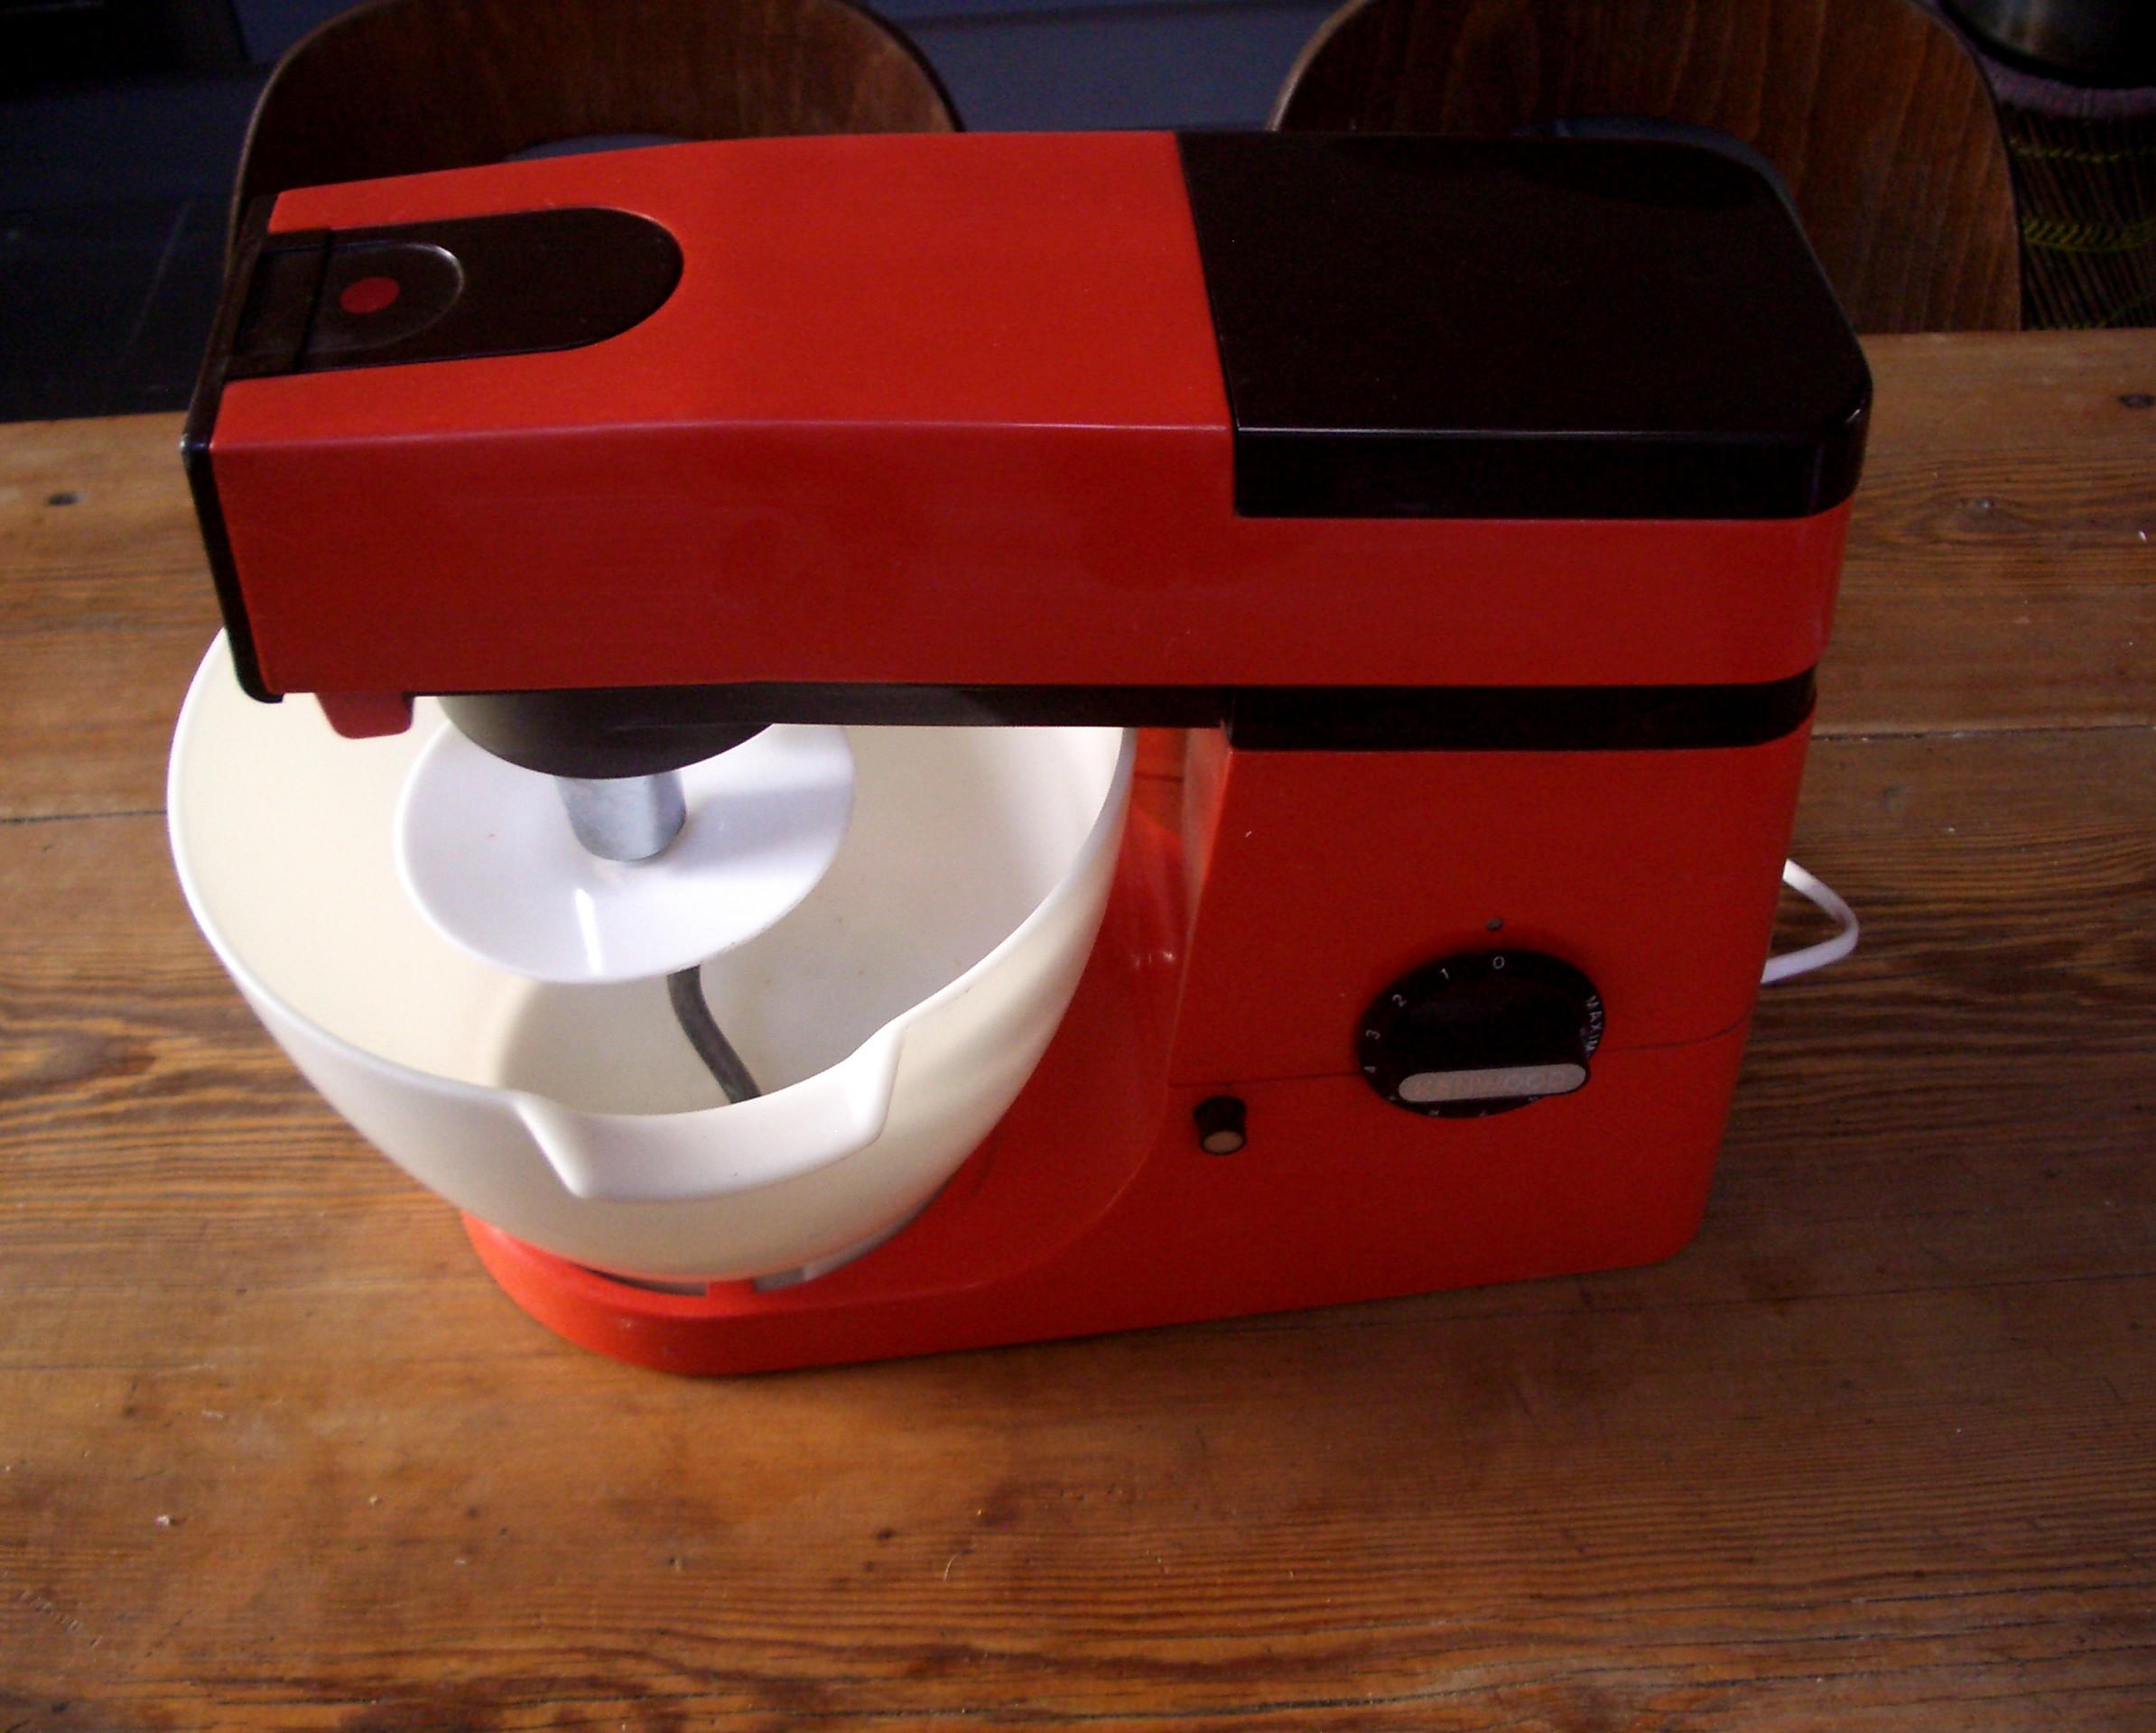 robot cuisine multifiction petrin kenwood chef a 901 orange vintage mixeur ebay. Black Bedroom Furniture Sets. Home Design Ideas